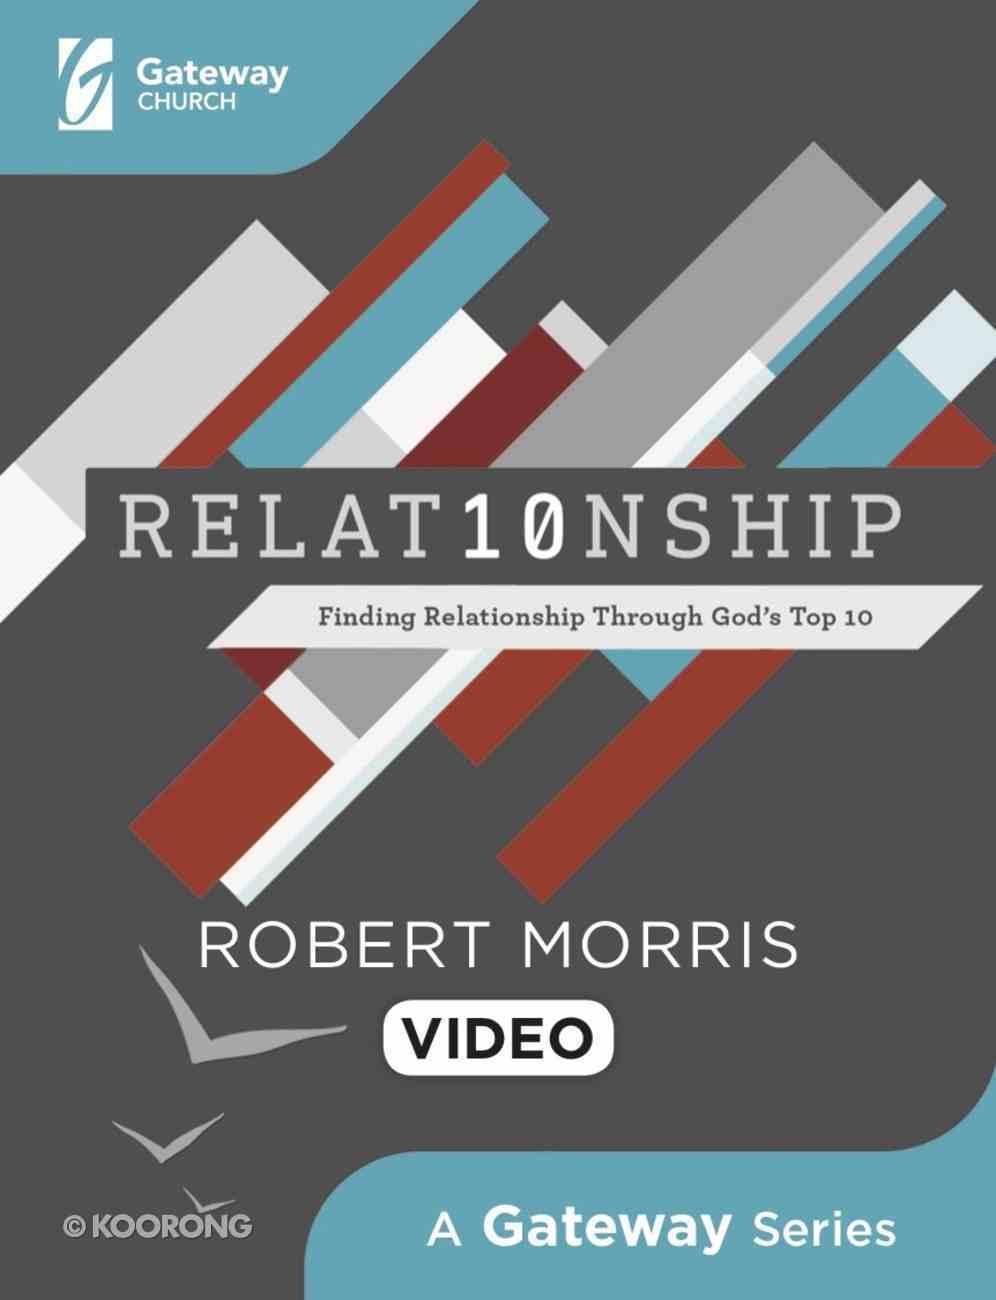 Relat10nship: Finding Relationship Through God's Top 10 (Dvd) DVD